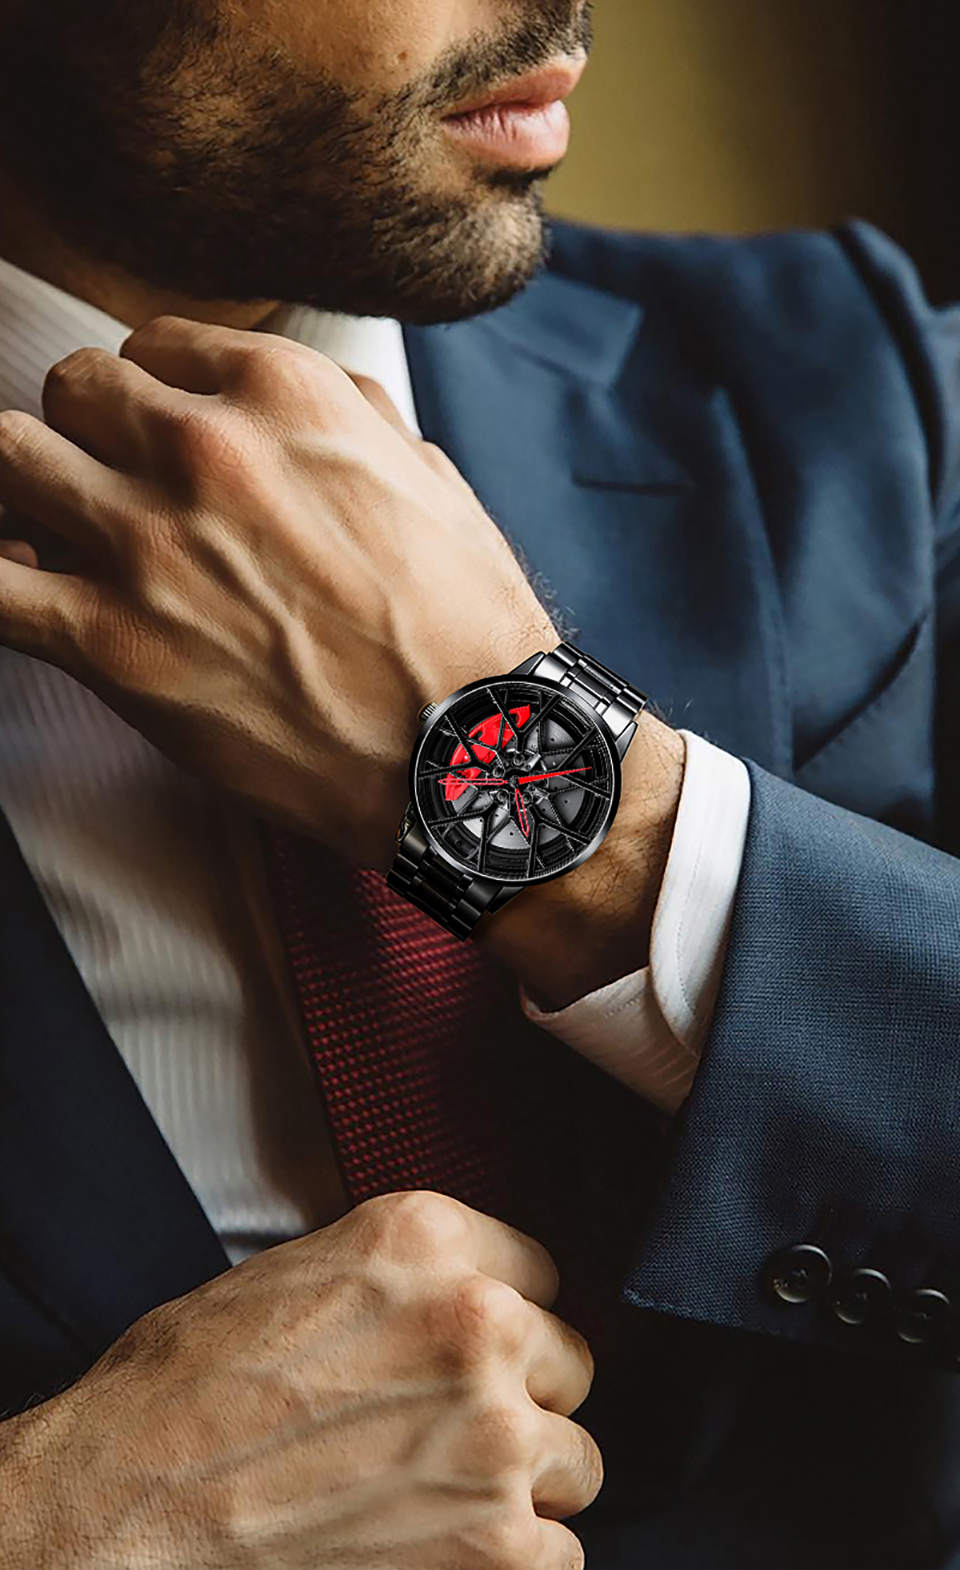 H80119ec588b54a42a25dc8fd4d4c2569A NIBOSI 2020 Car Rim Hub Wheel Watch Custom Design